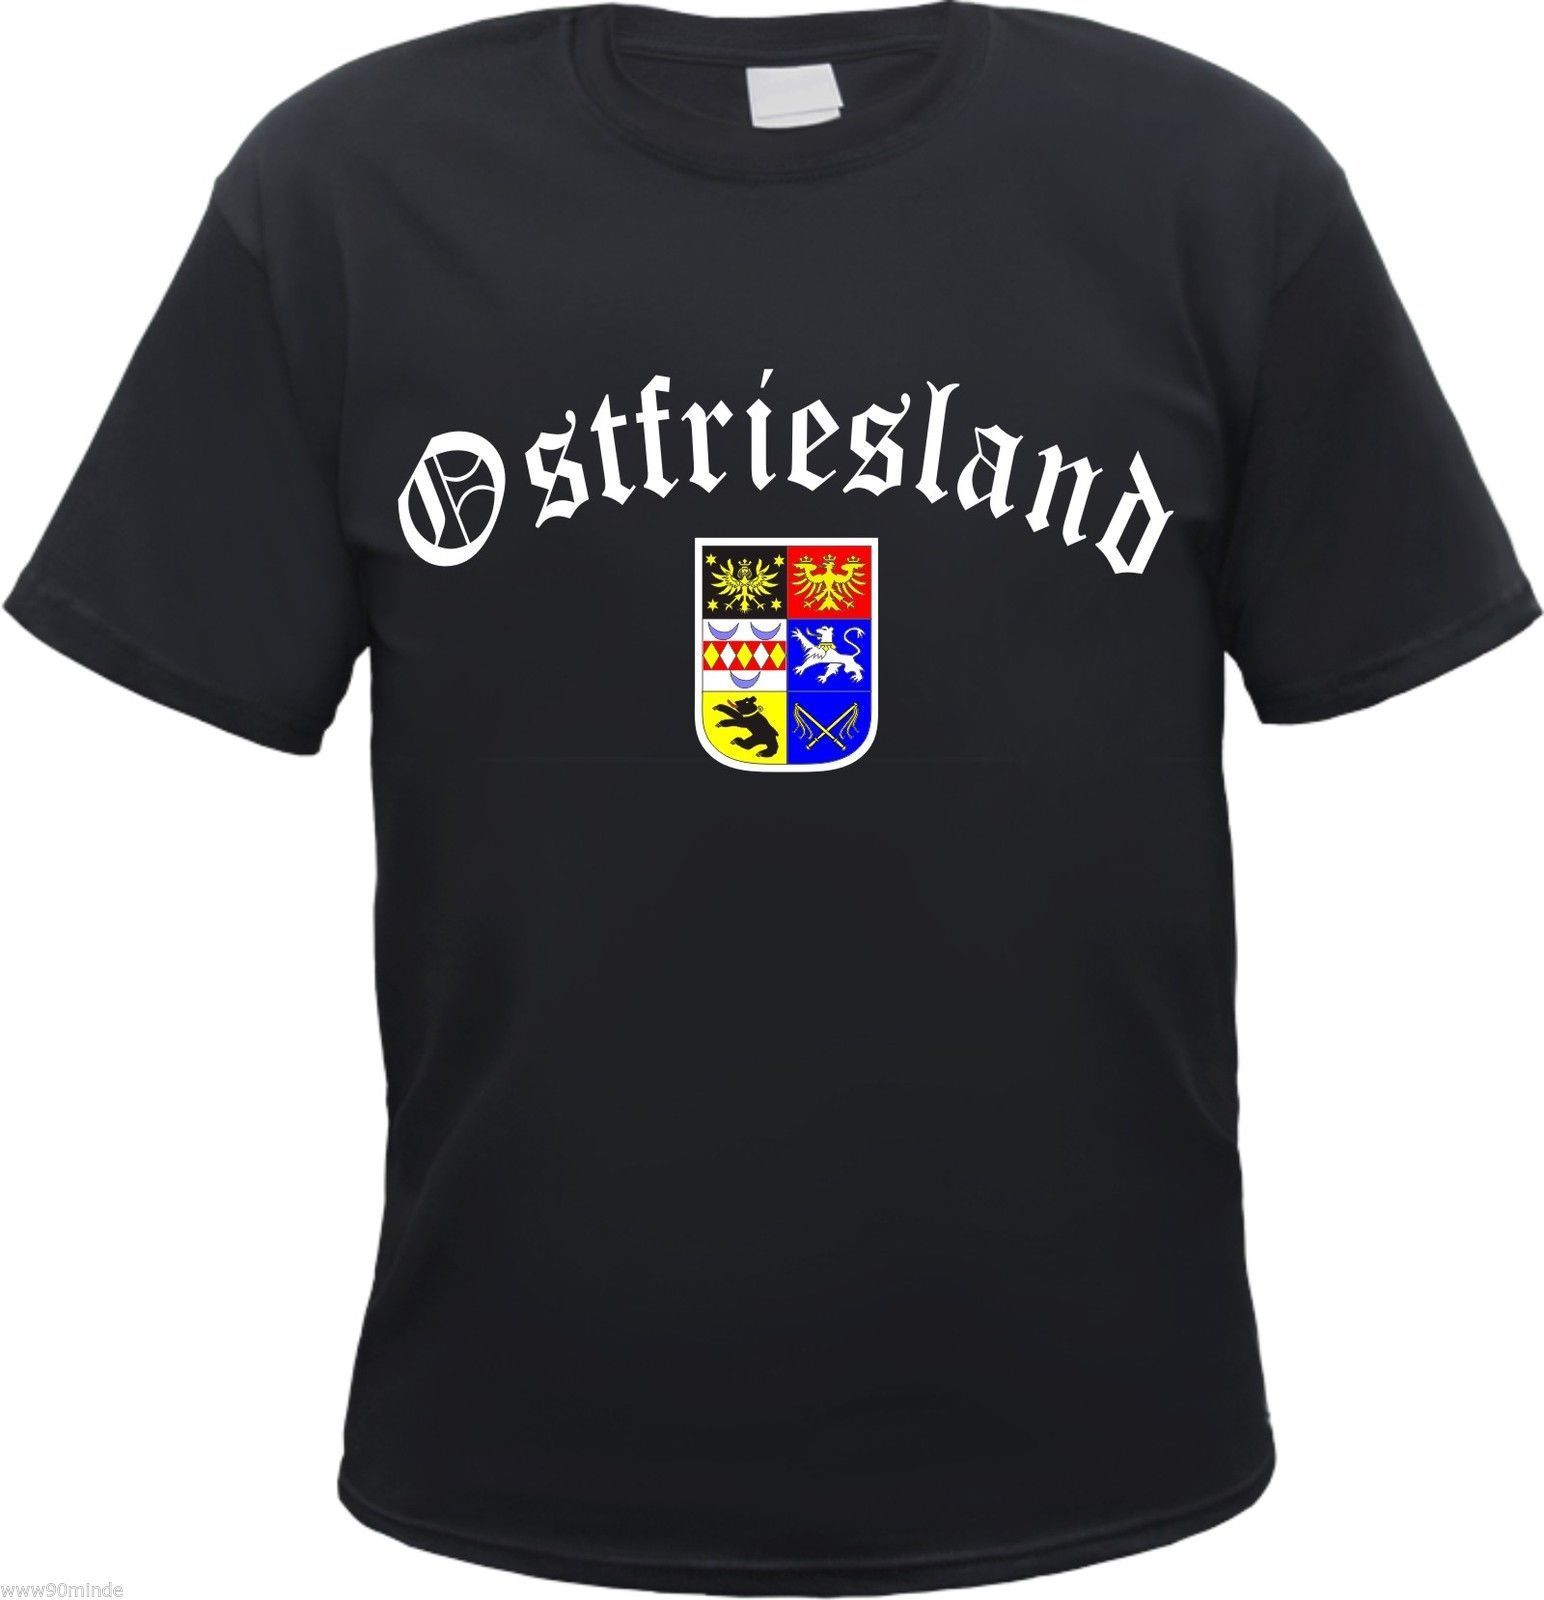 OSTFRIESLAND T-Shirt schwarz-altdeutsch/wappen-s bis 3XL-emden aurich leer